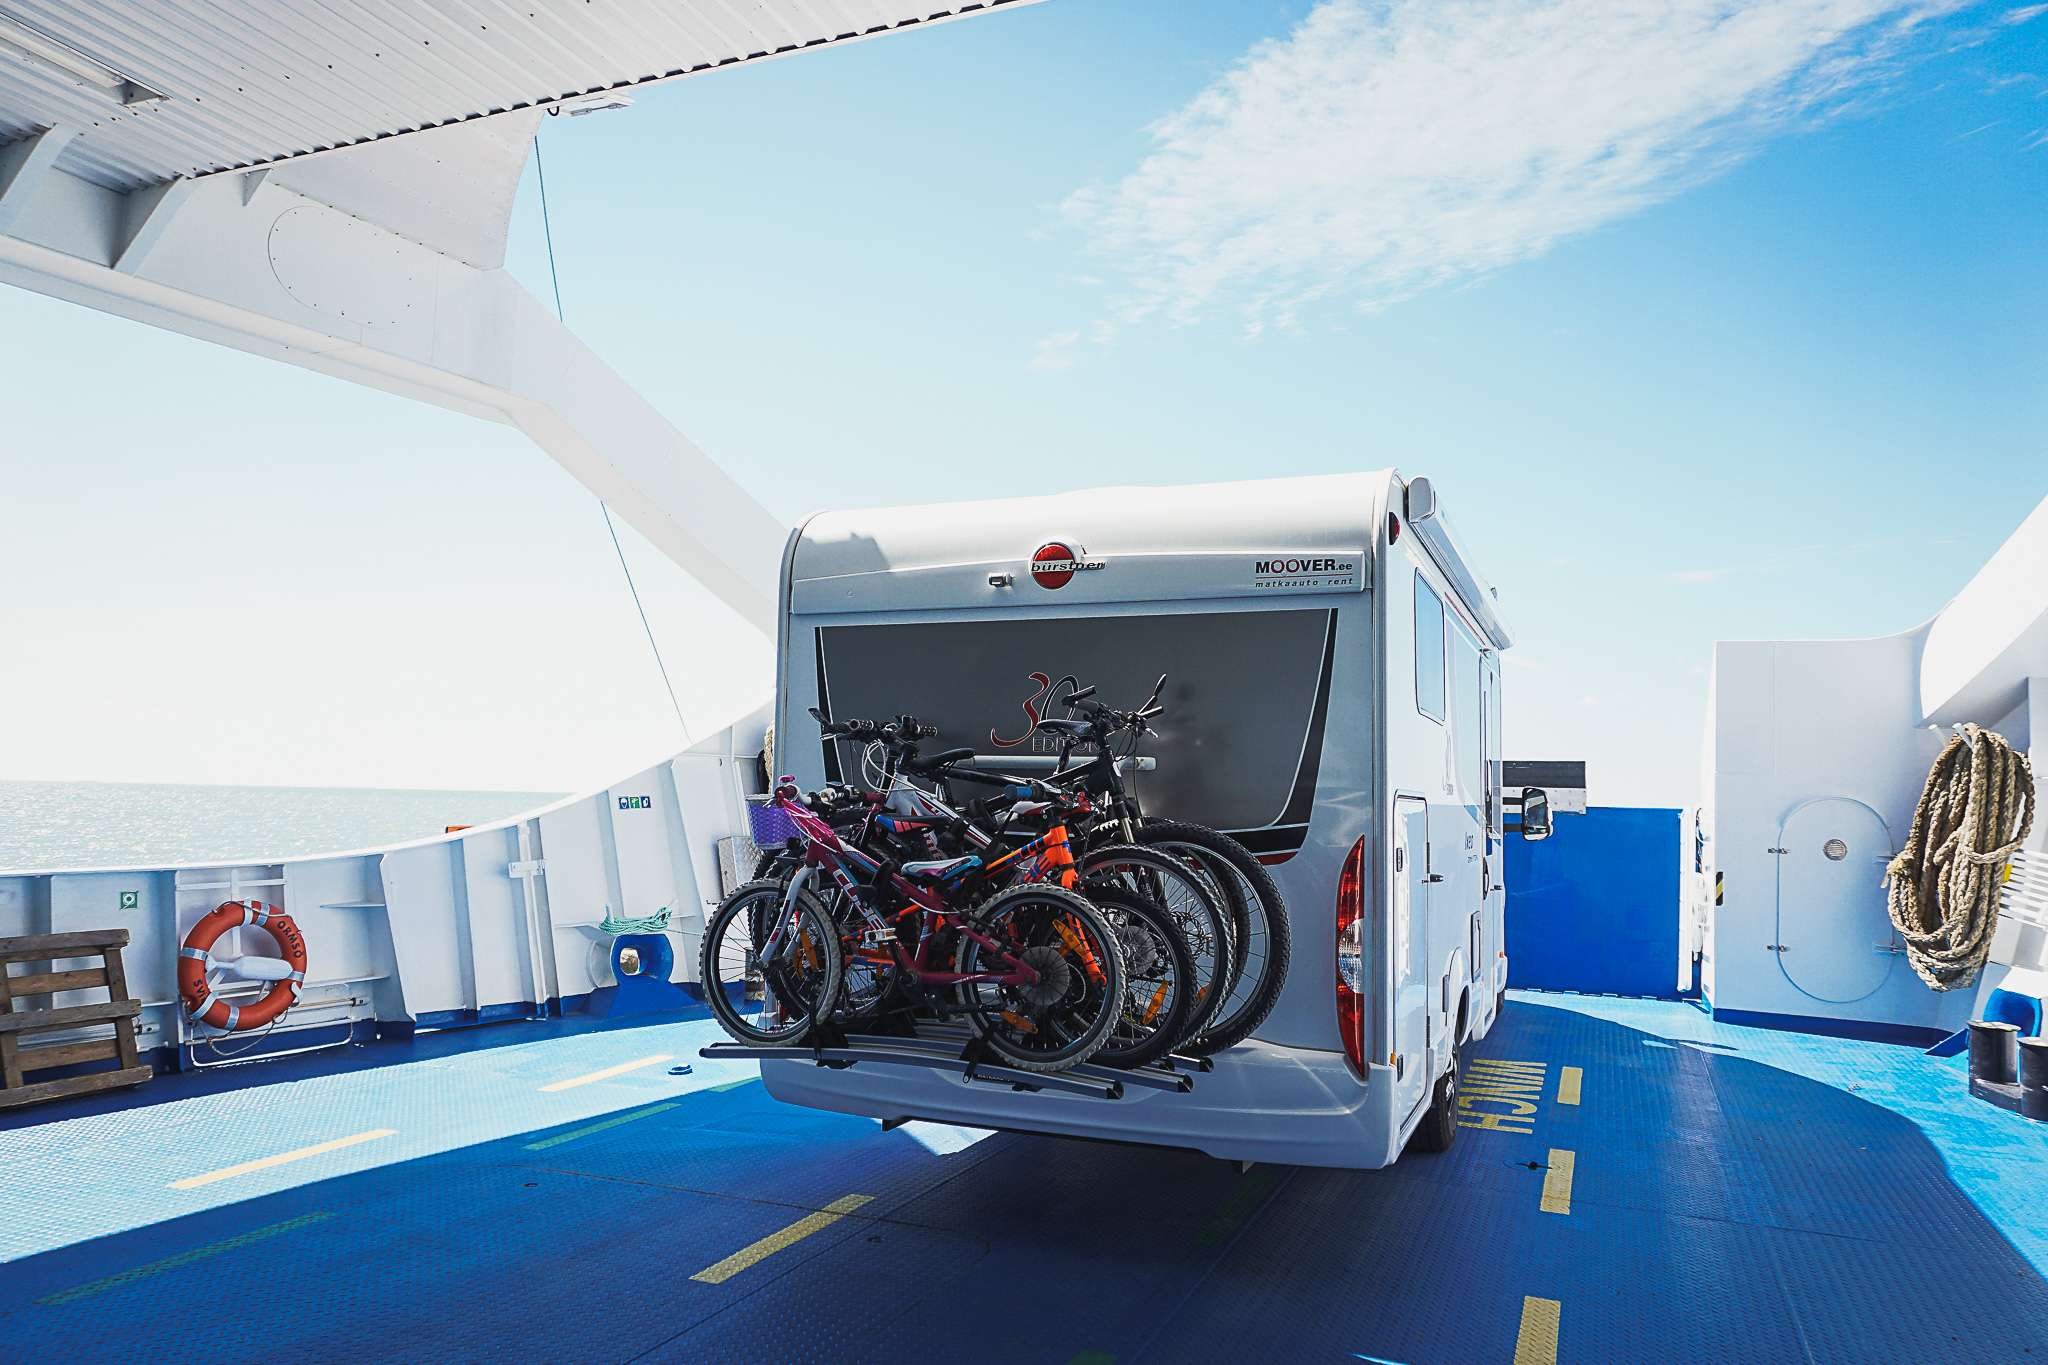 Matkaautoga Vormsi saarel